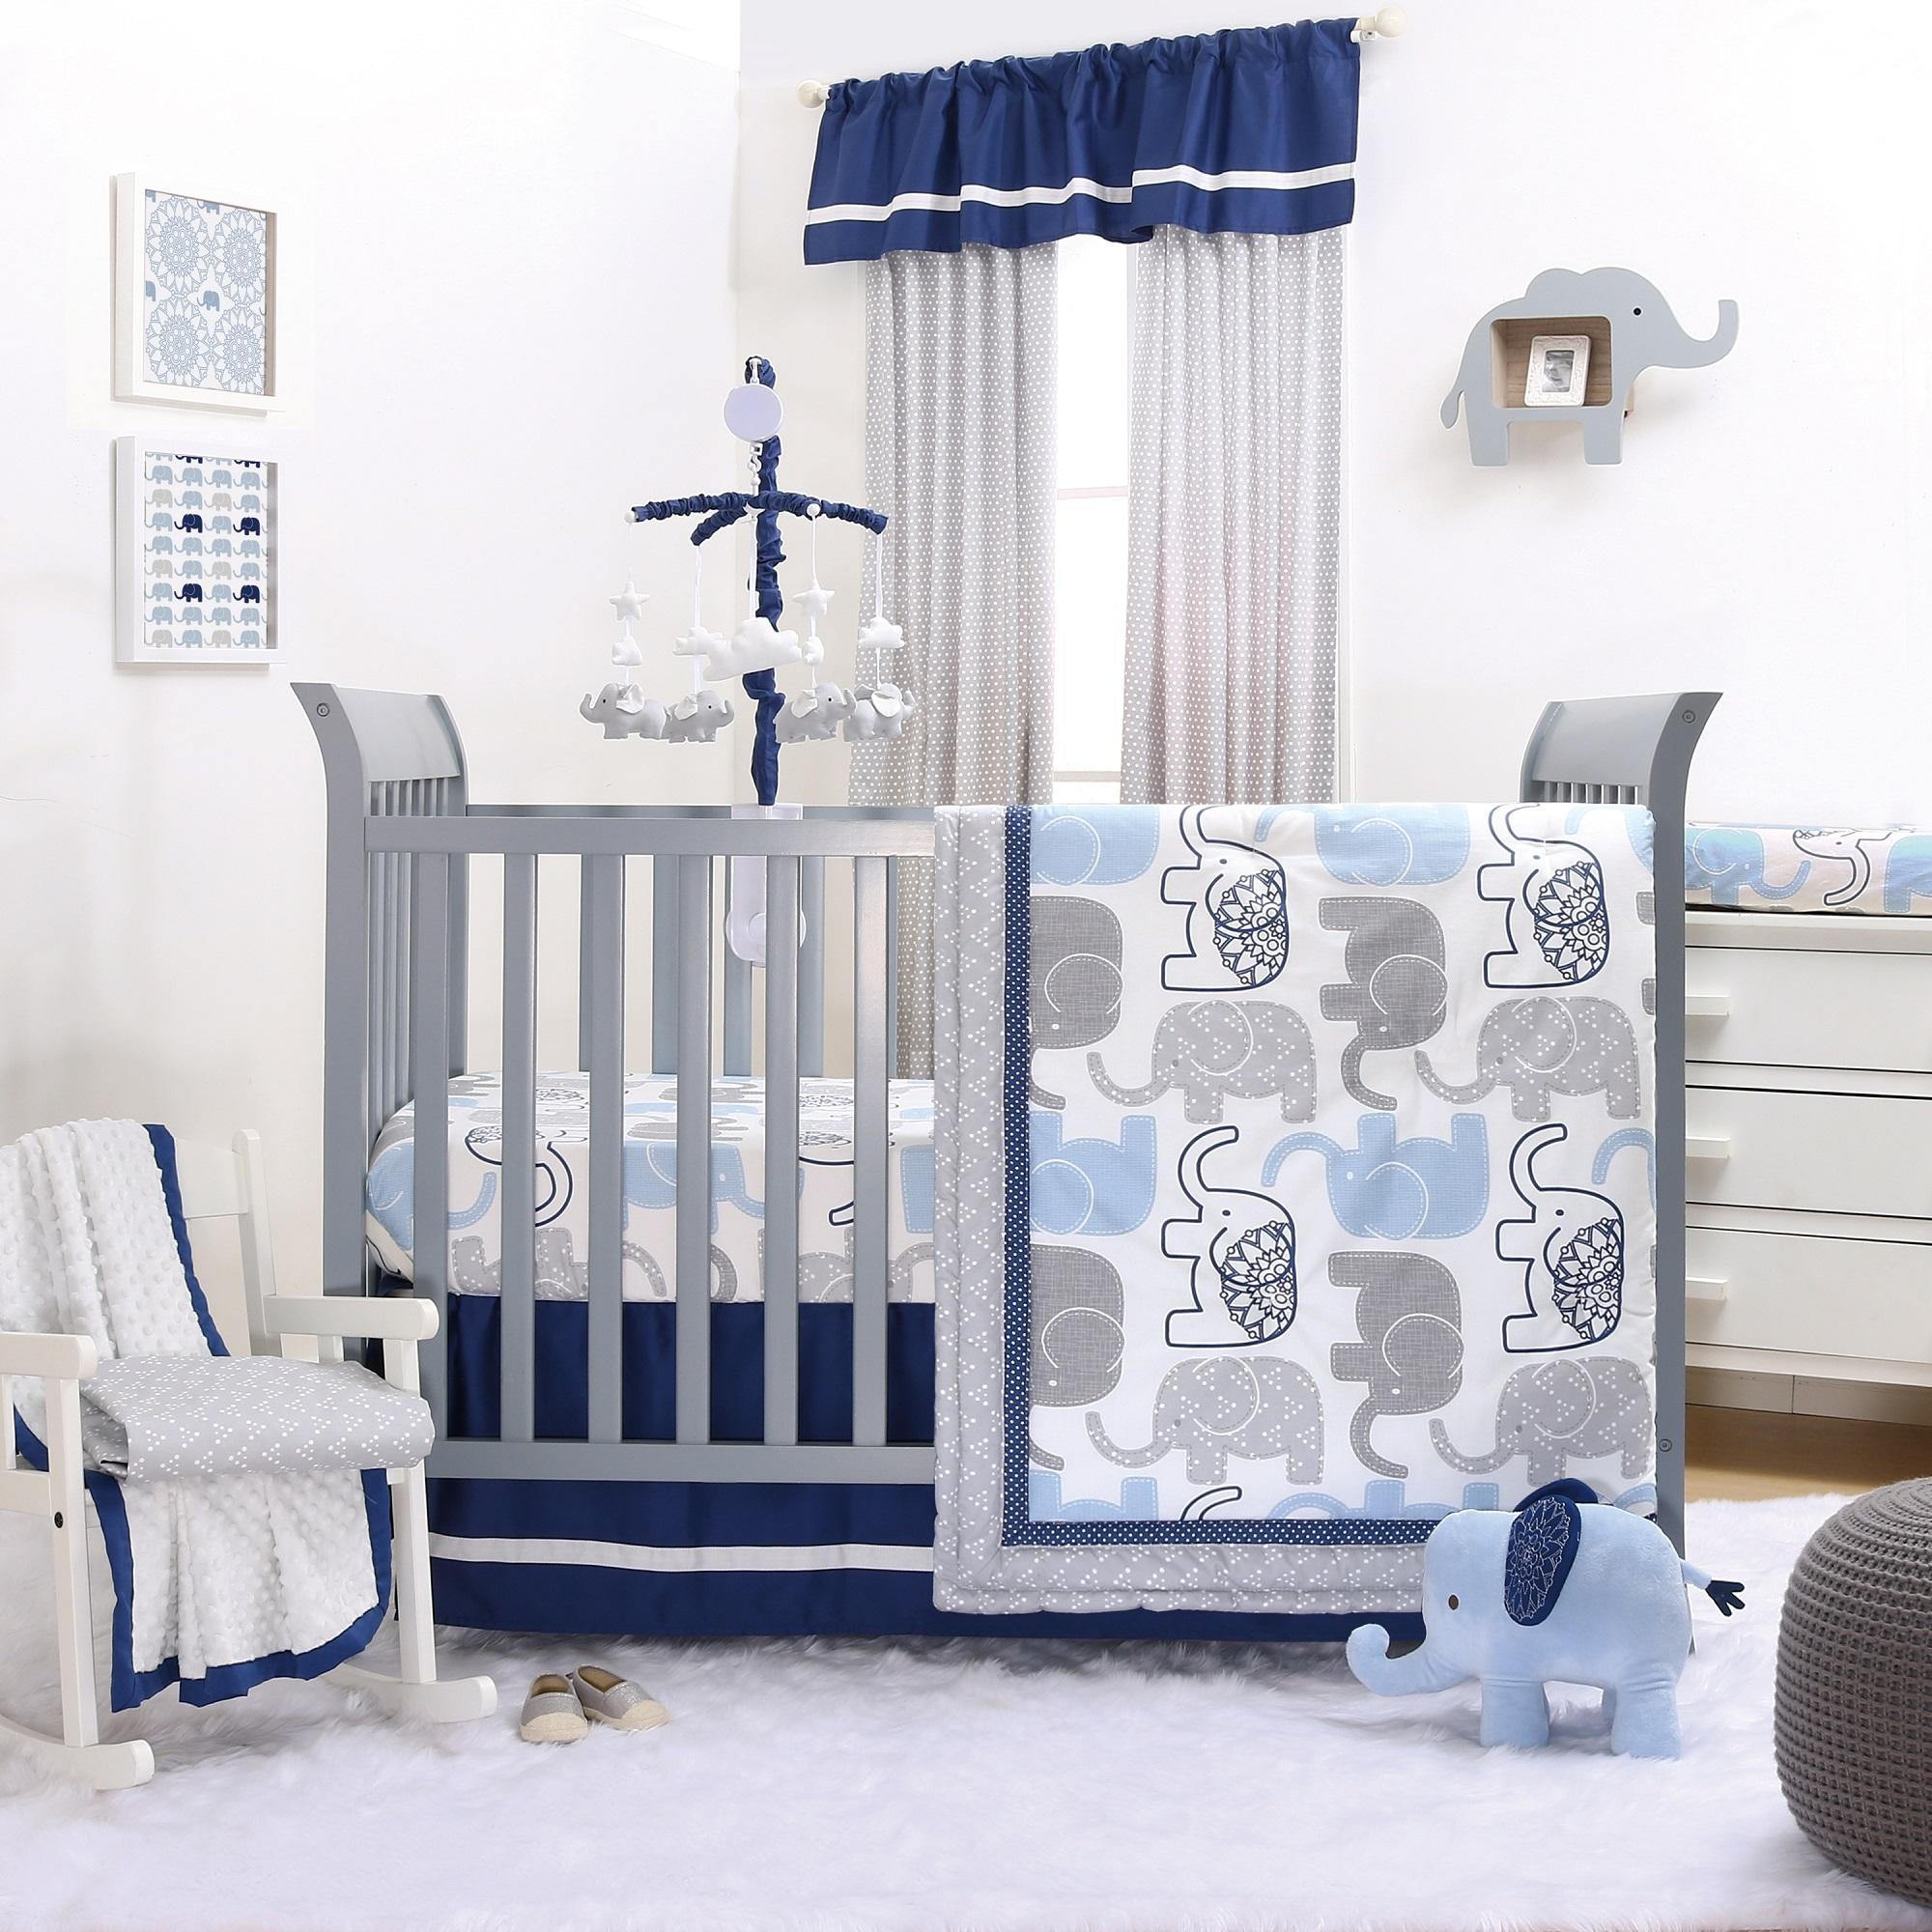 Little Peanut Navy Crib Bedding Set